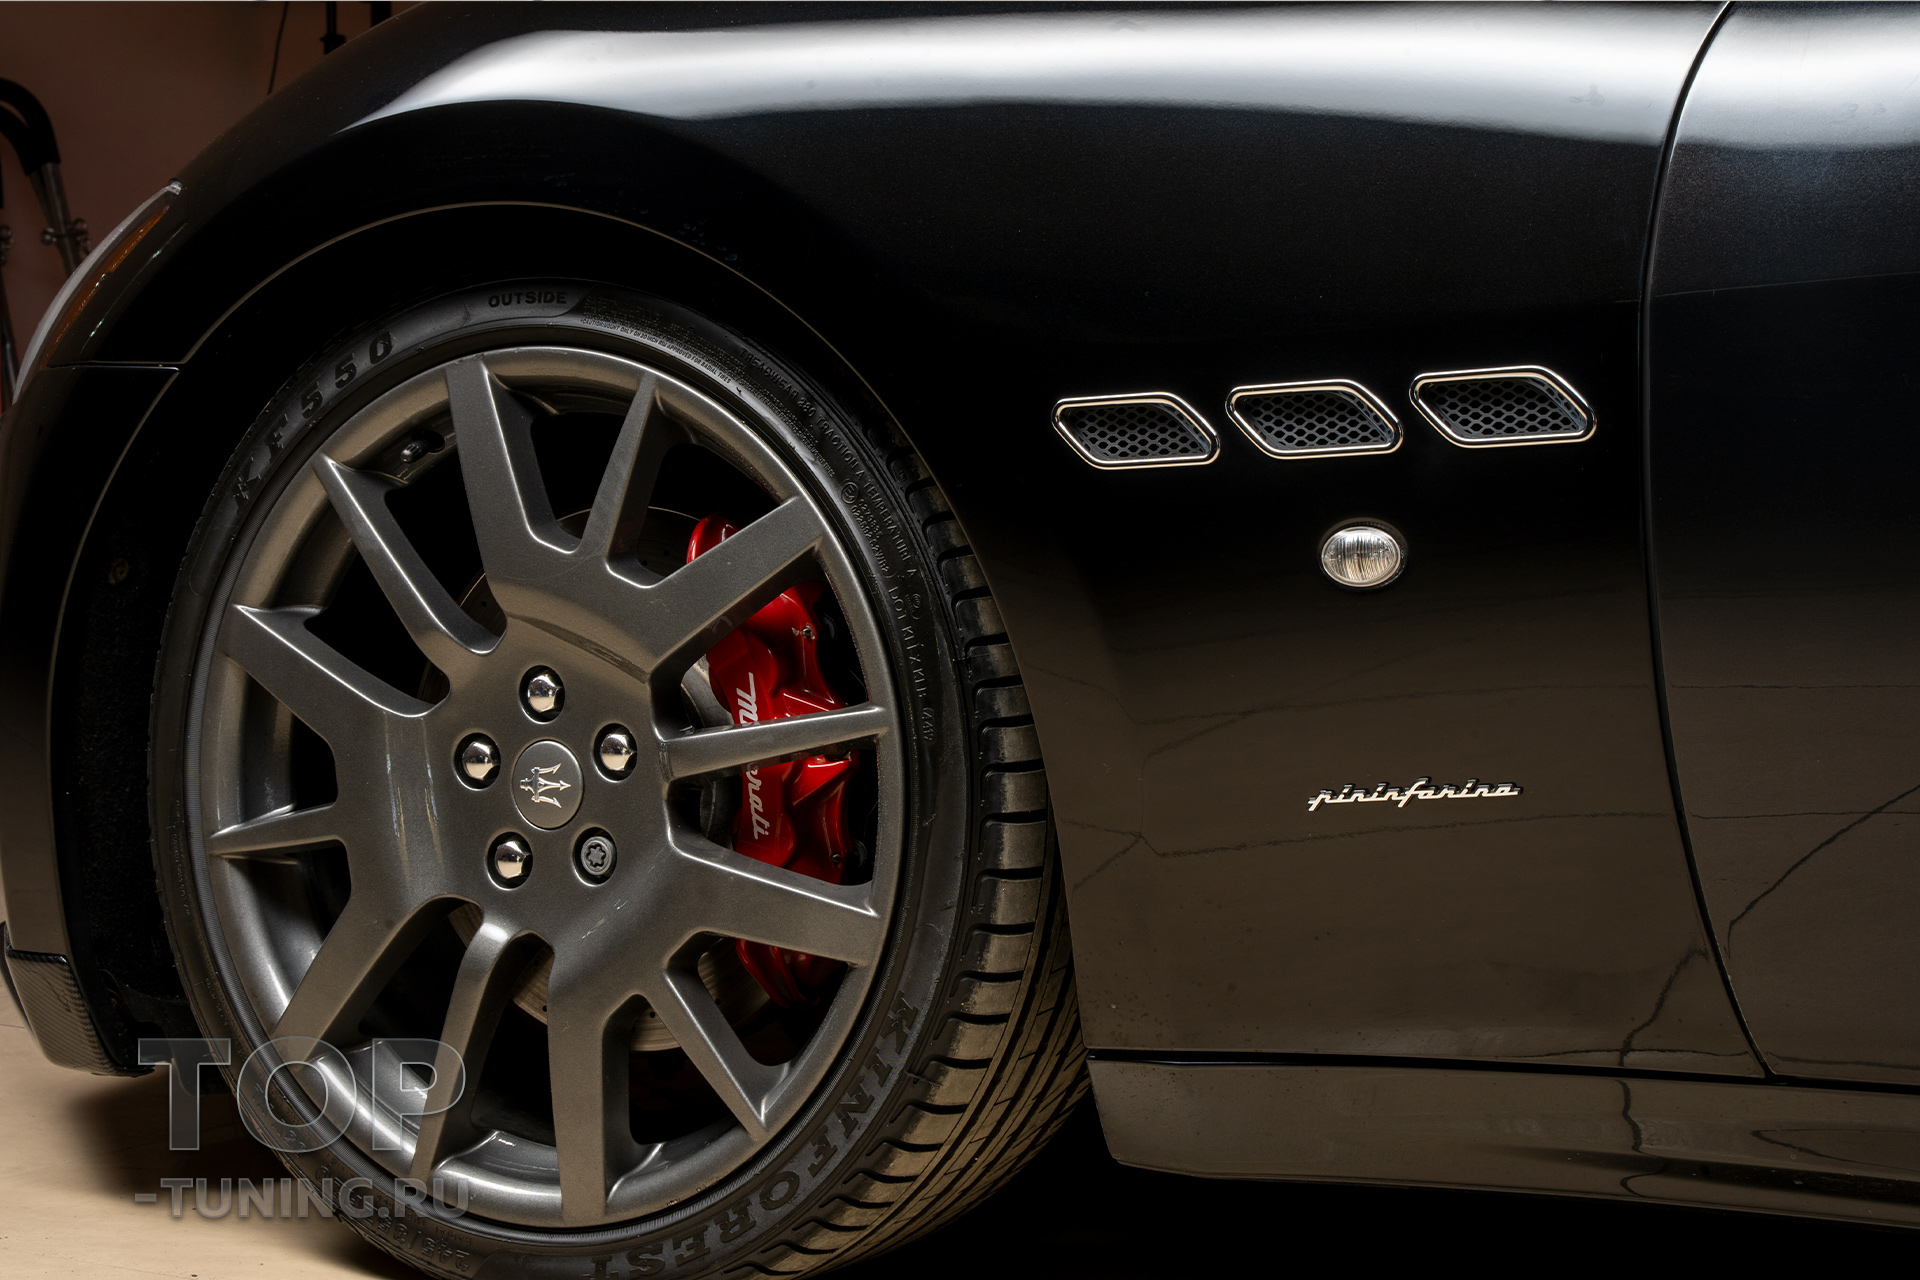 Жабры в крыльях. Эмблема Pininfarina